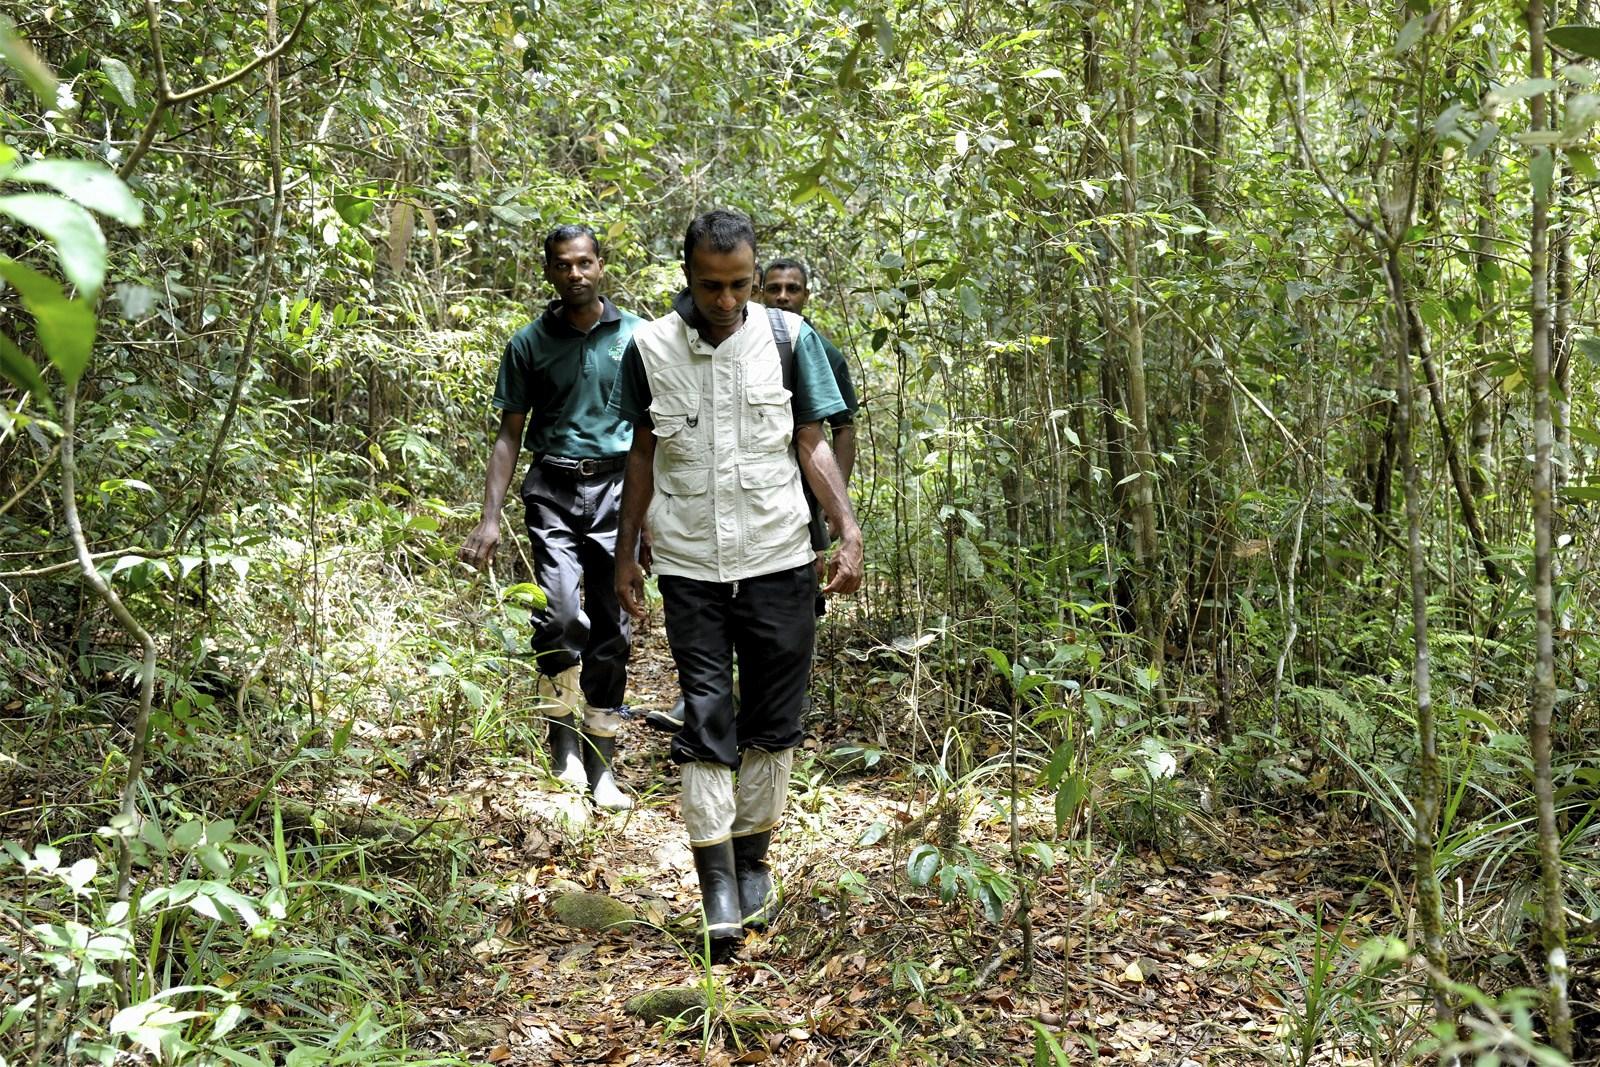 Trekking in Sinharaja Forest Sri Lanka